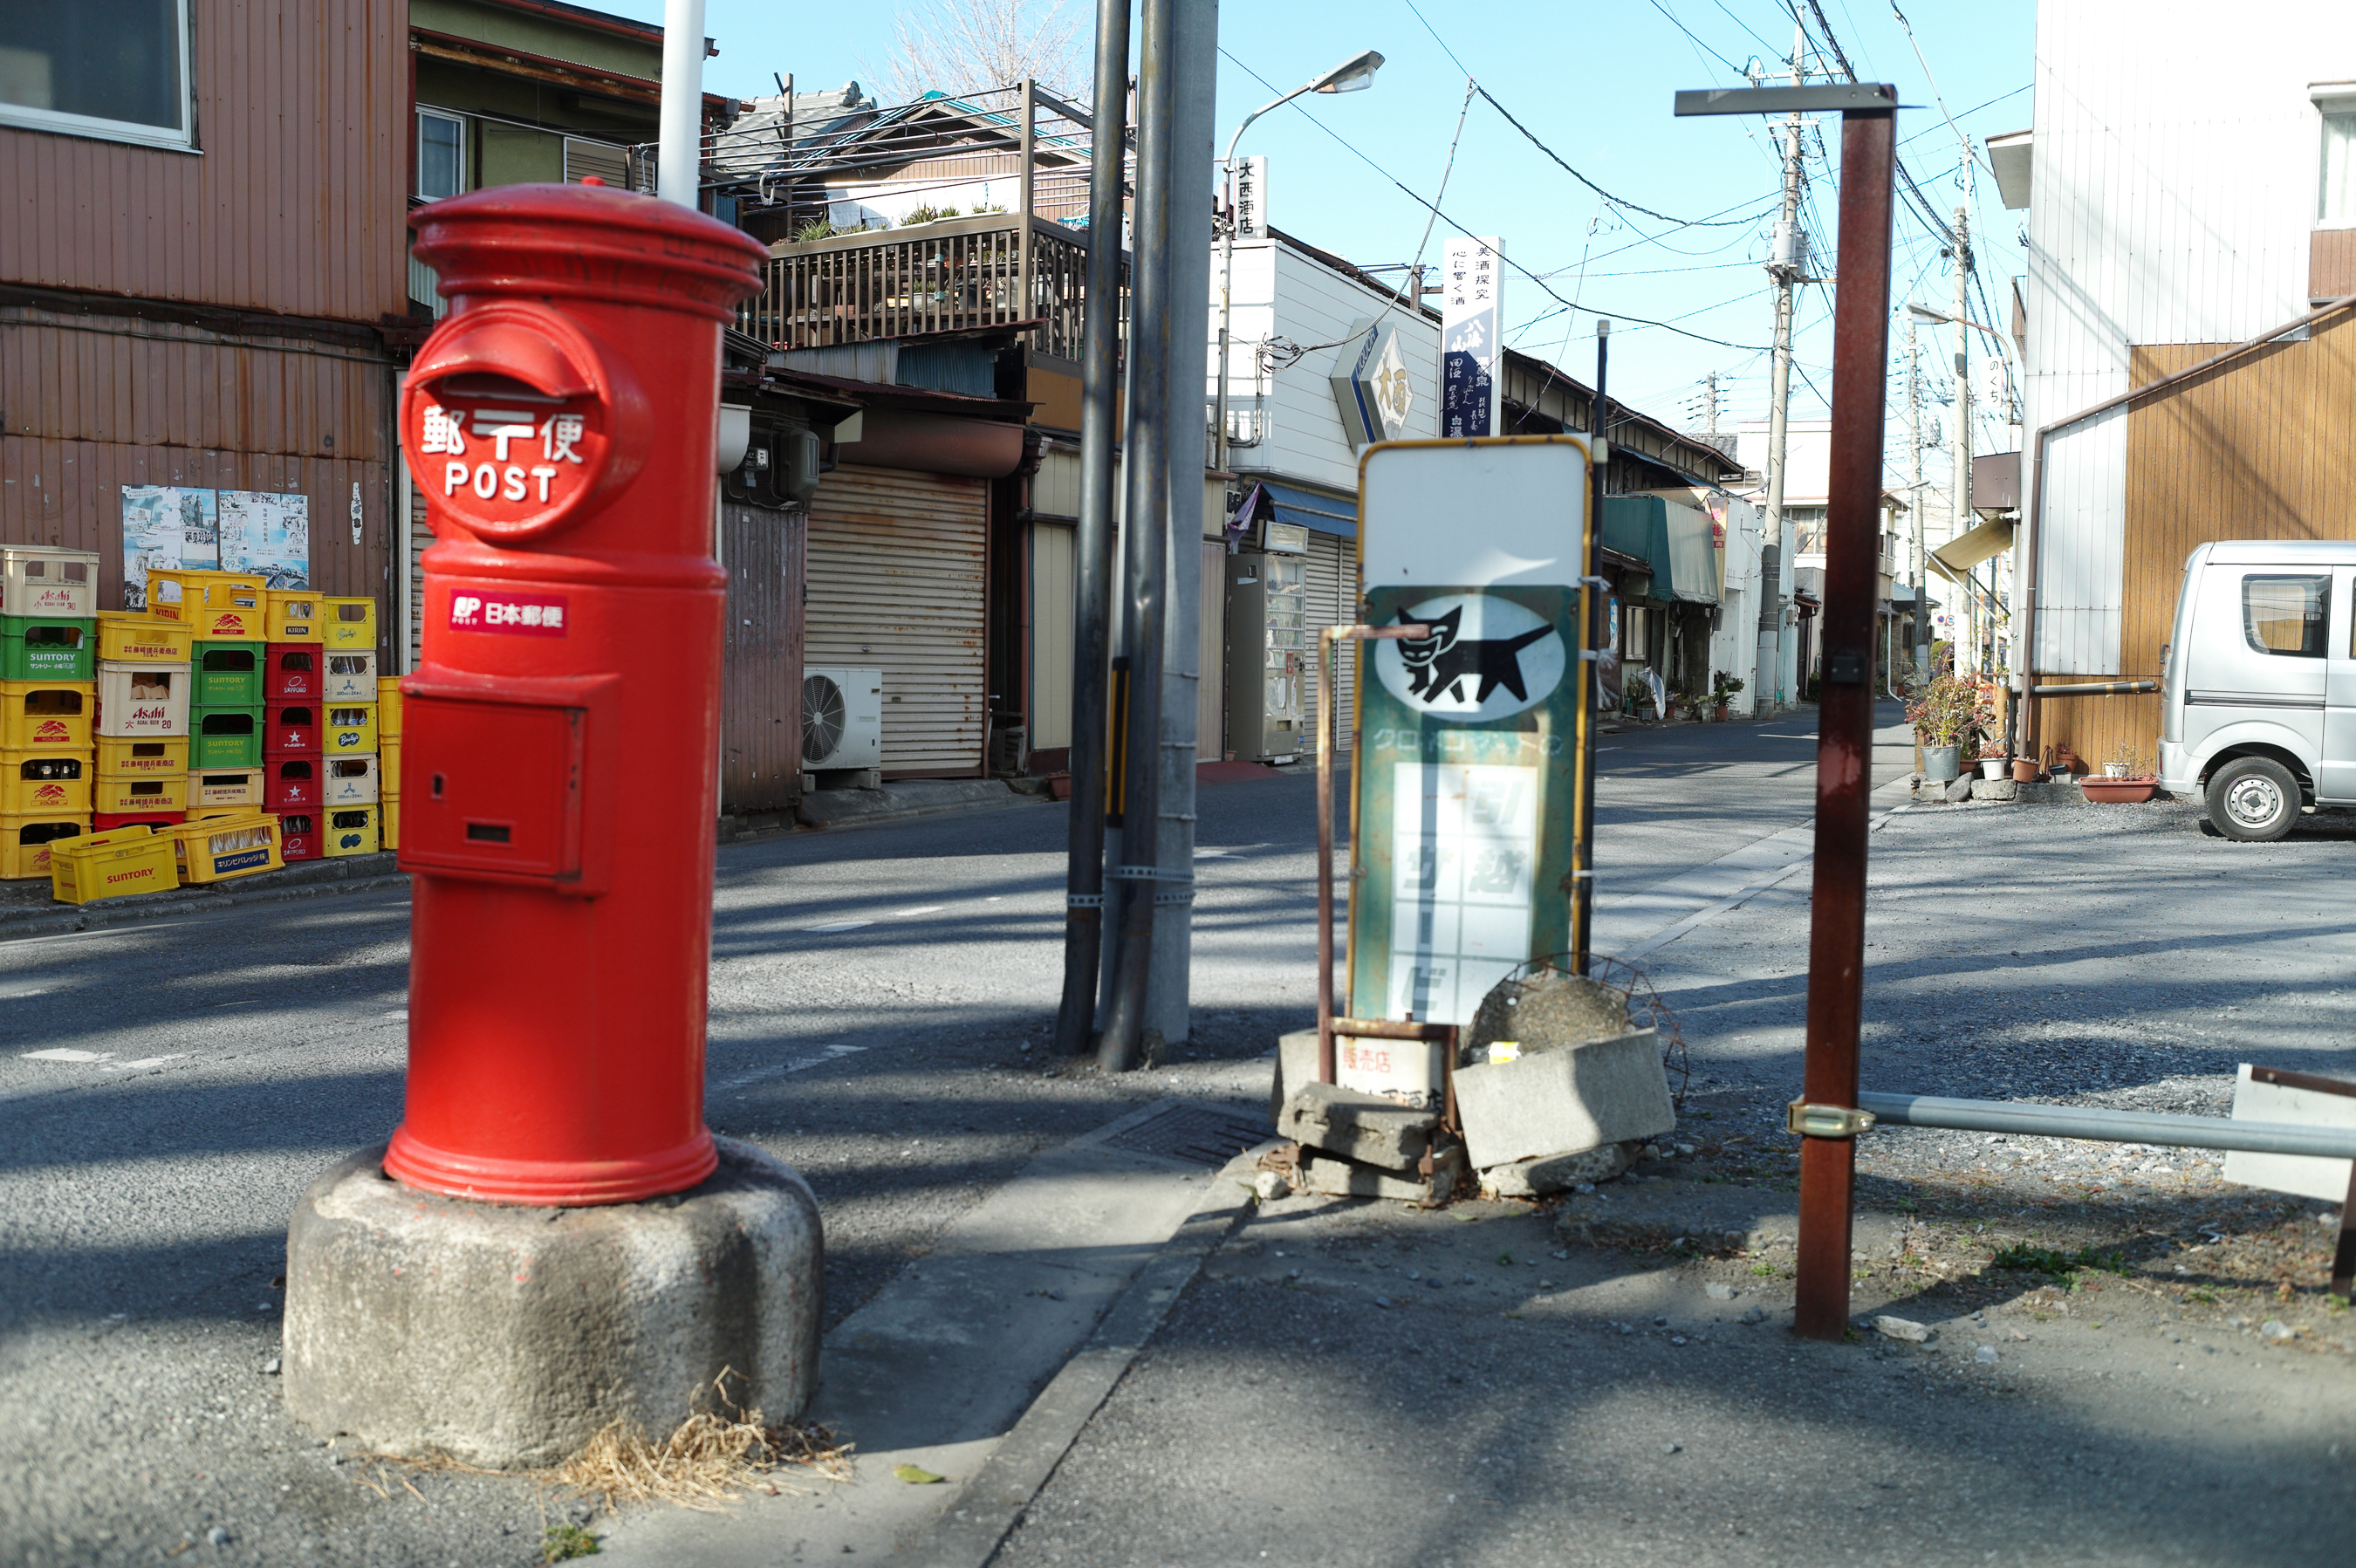 f:id:aoyama-takuro:20180211220216j:plain